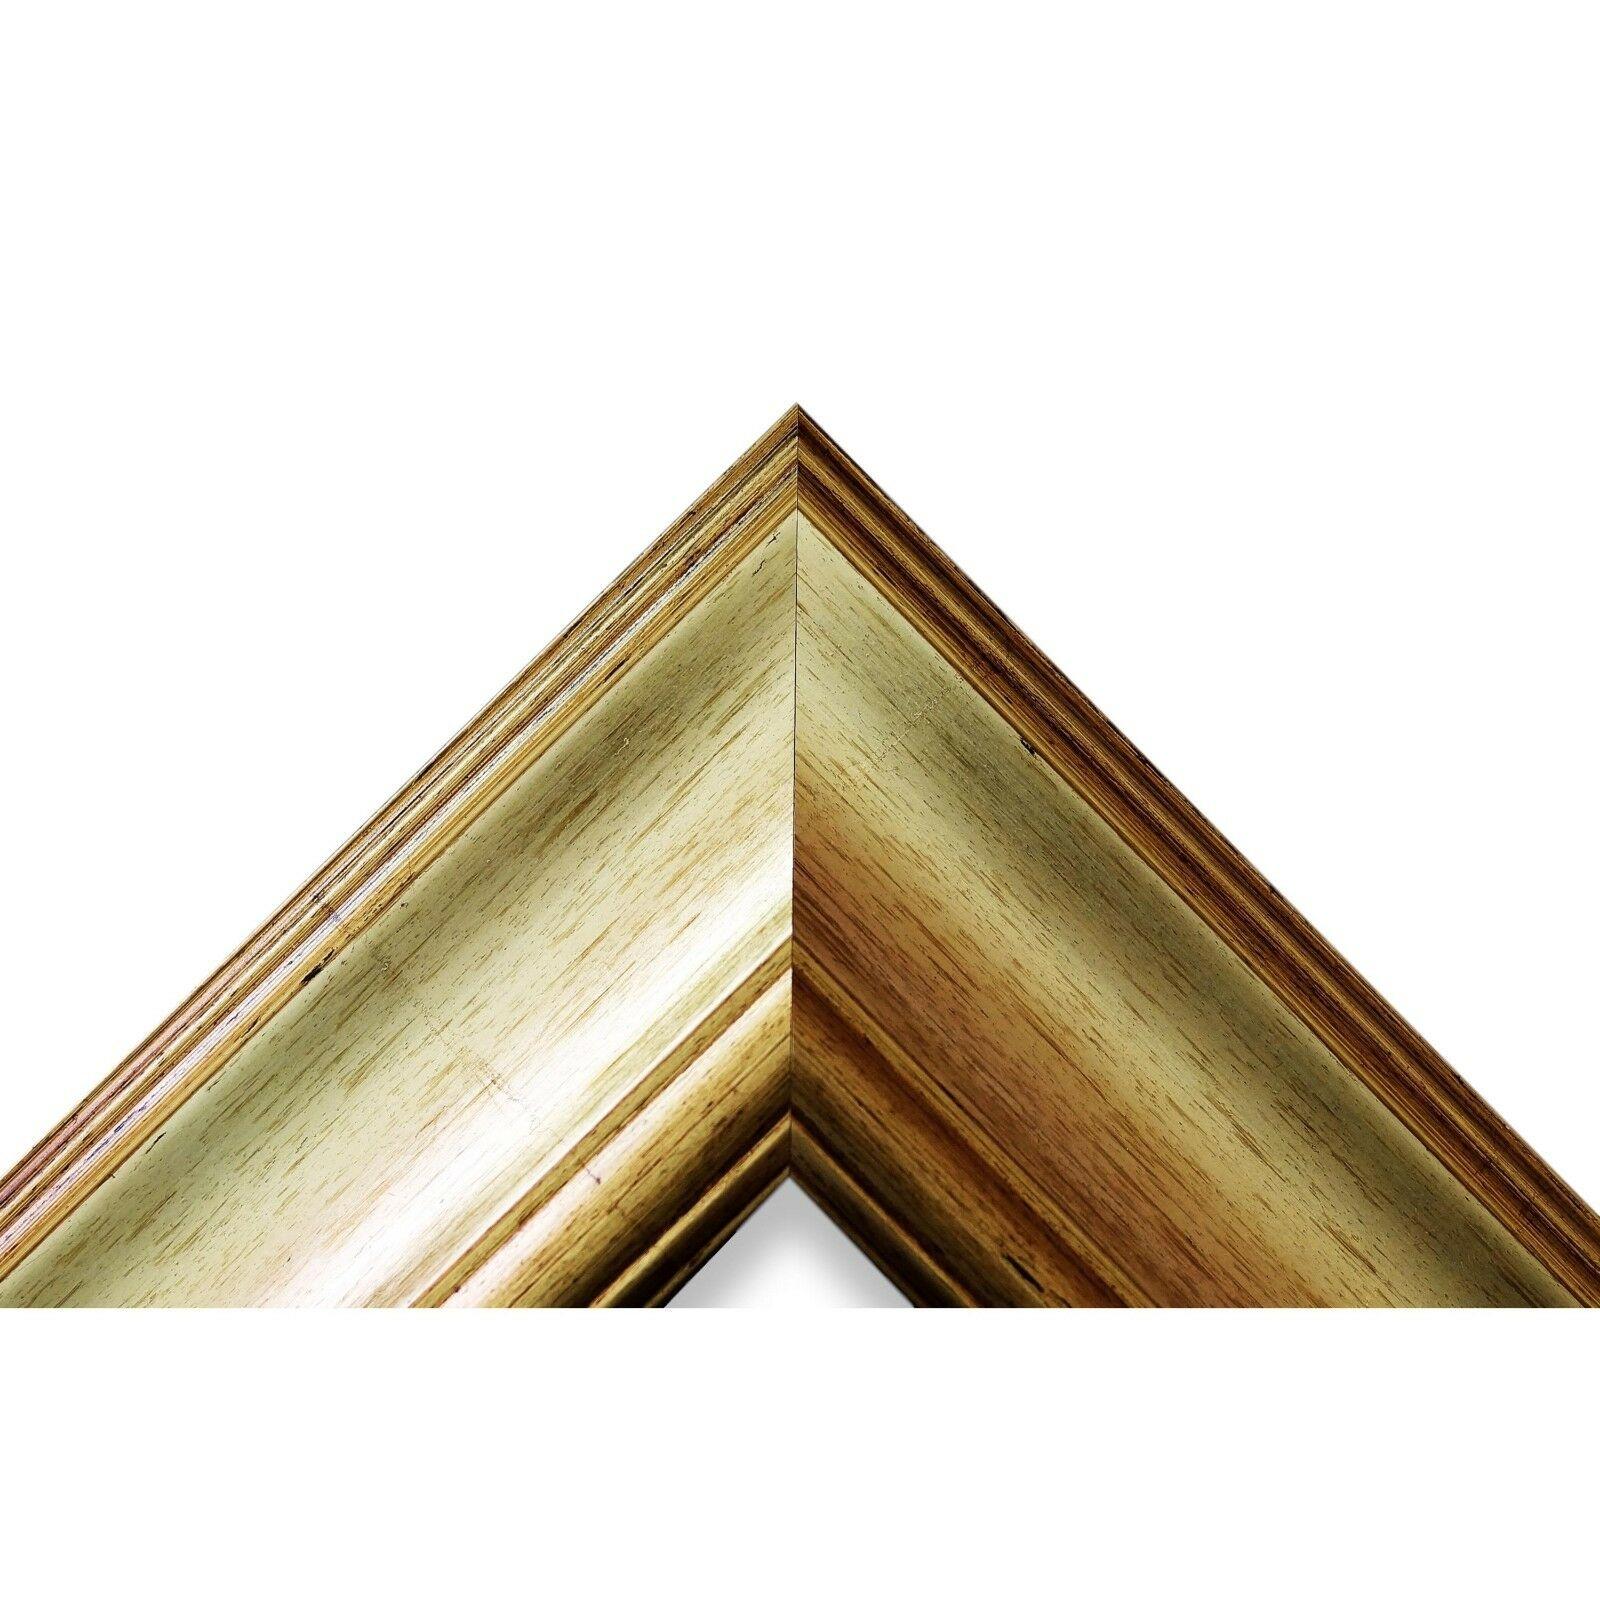 NEU alle Größen Wandspiegel Spiegel Braun Gold Klassisch Barock Acta 6,7